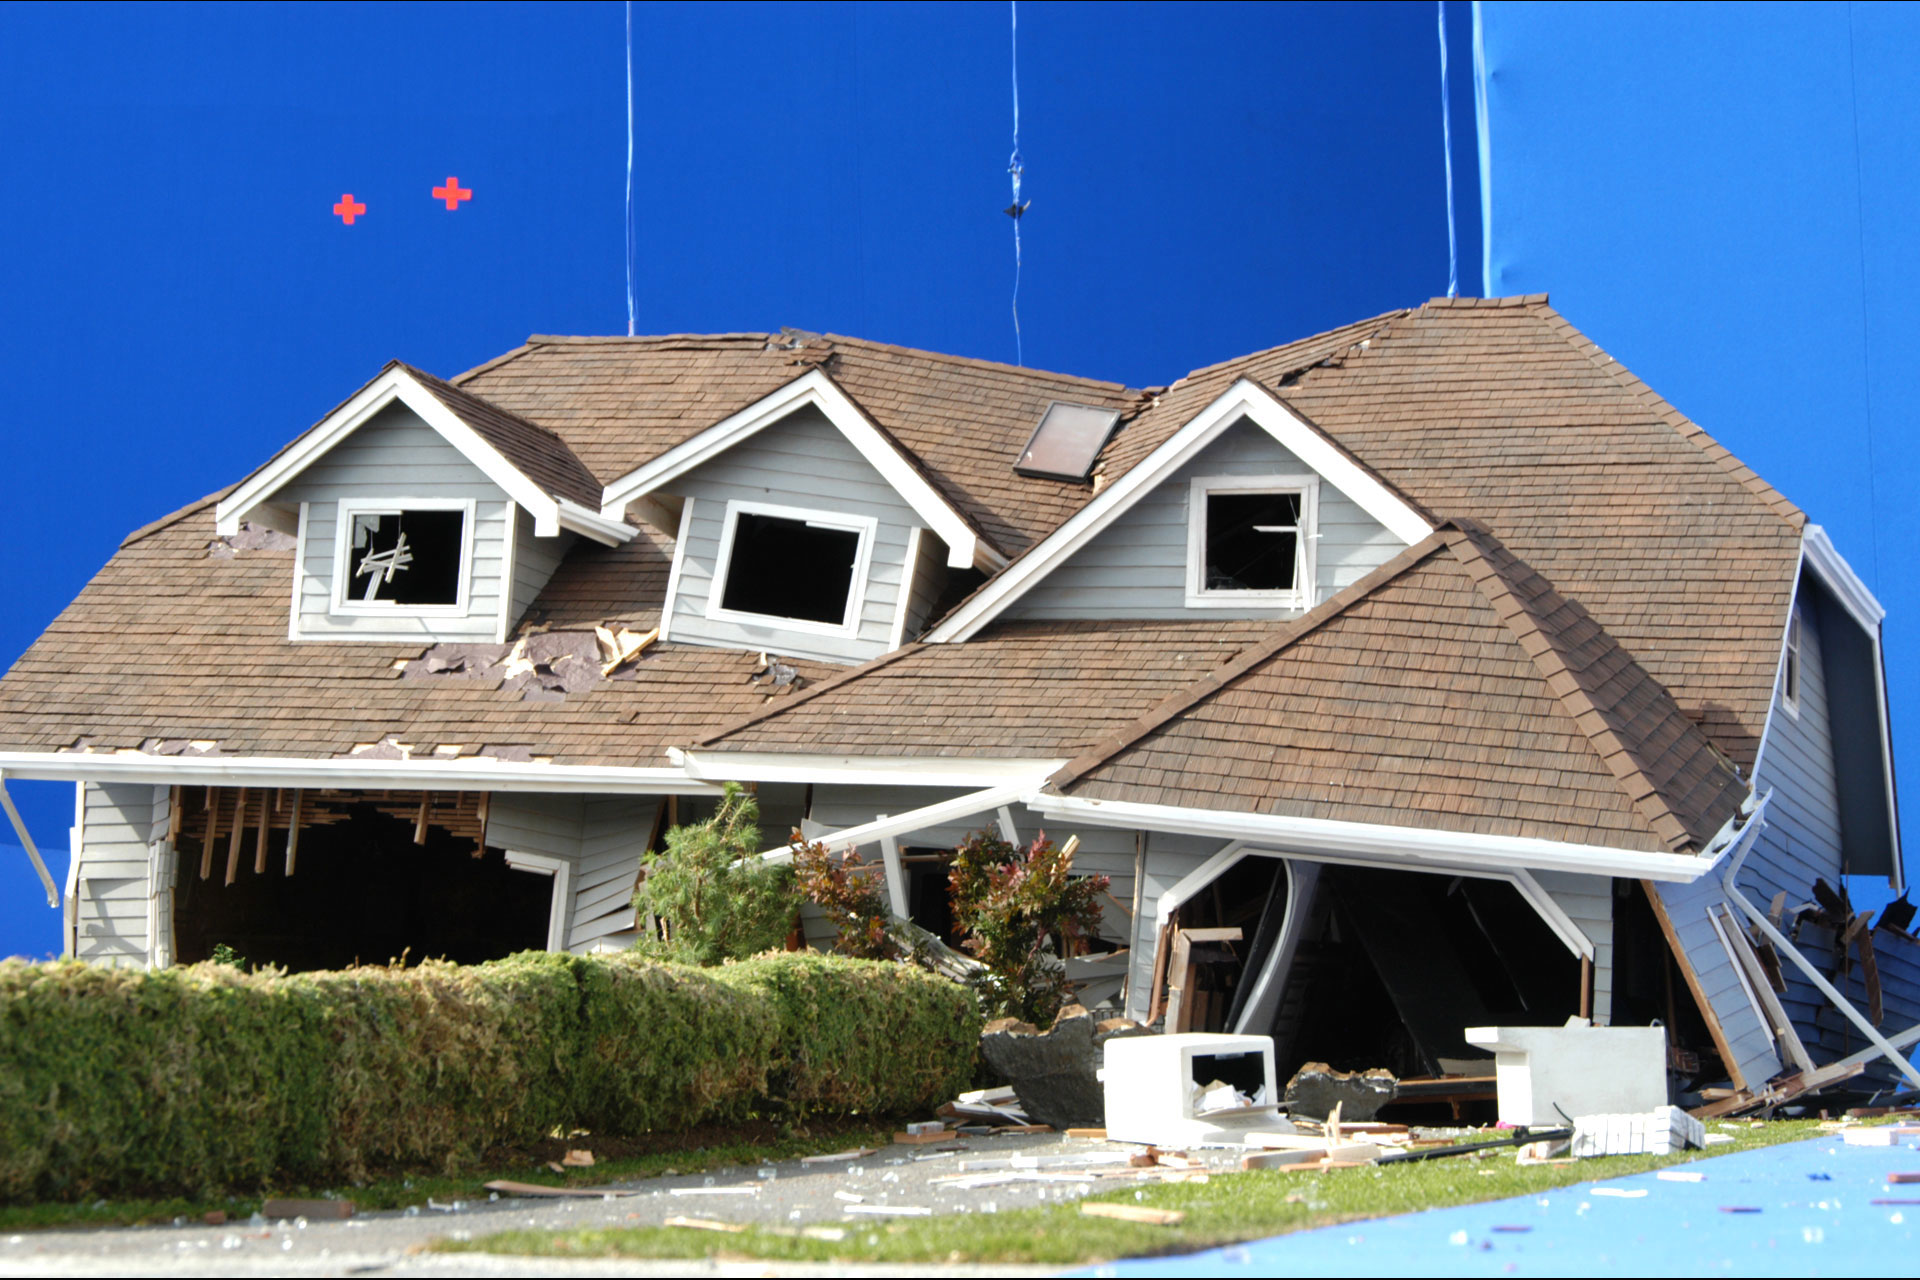 610_391_house_aftermath_02.jpg